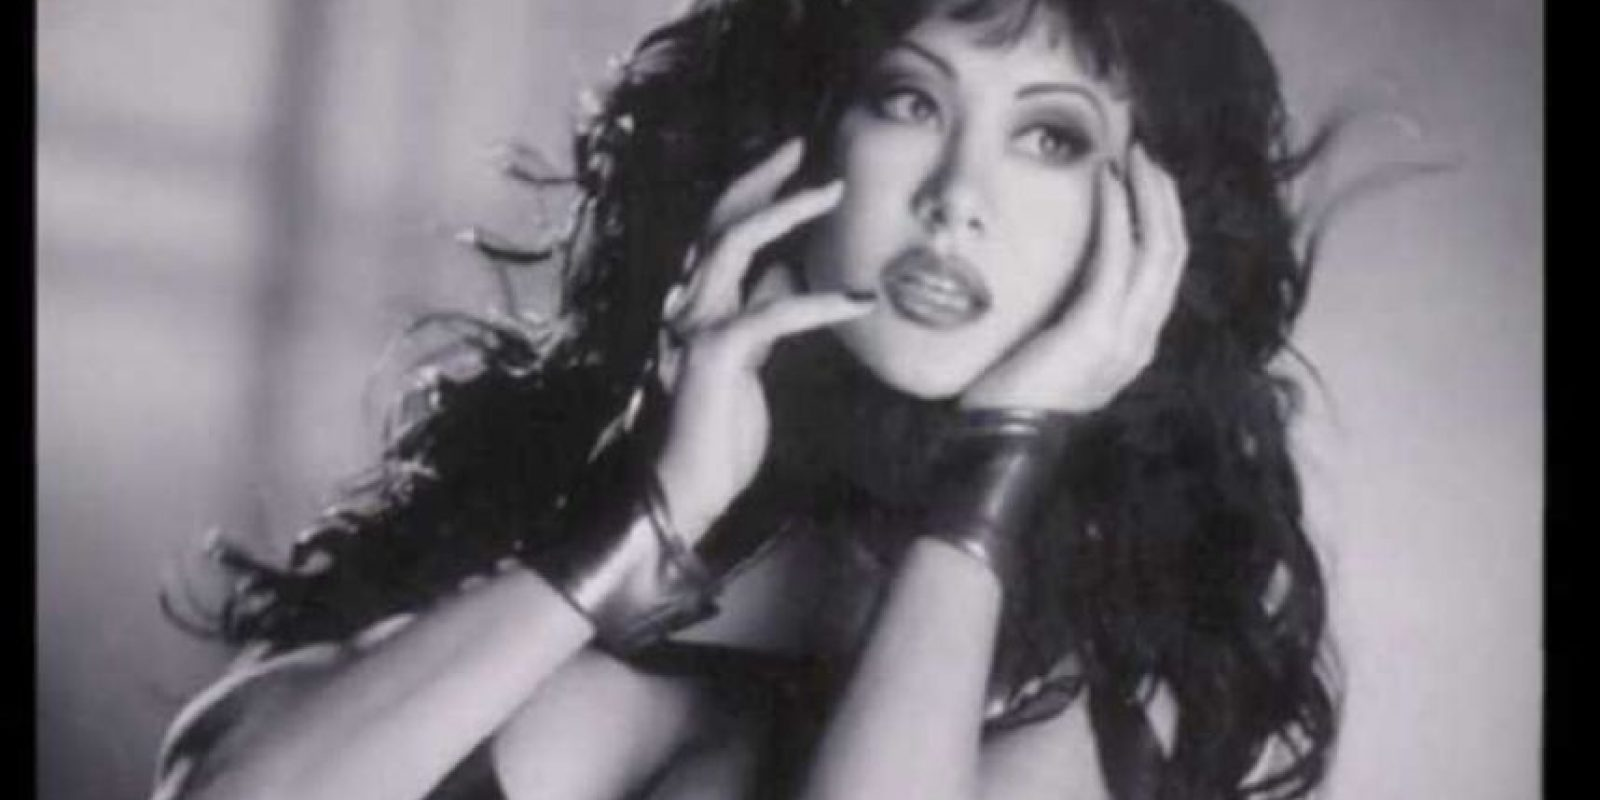 Asia Carrera fue la primera estrella porno asiática Foto:Oxymoron Entertainment